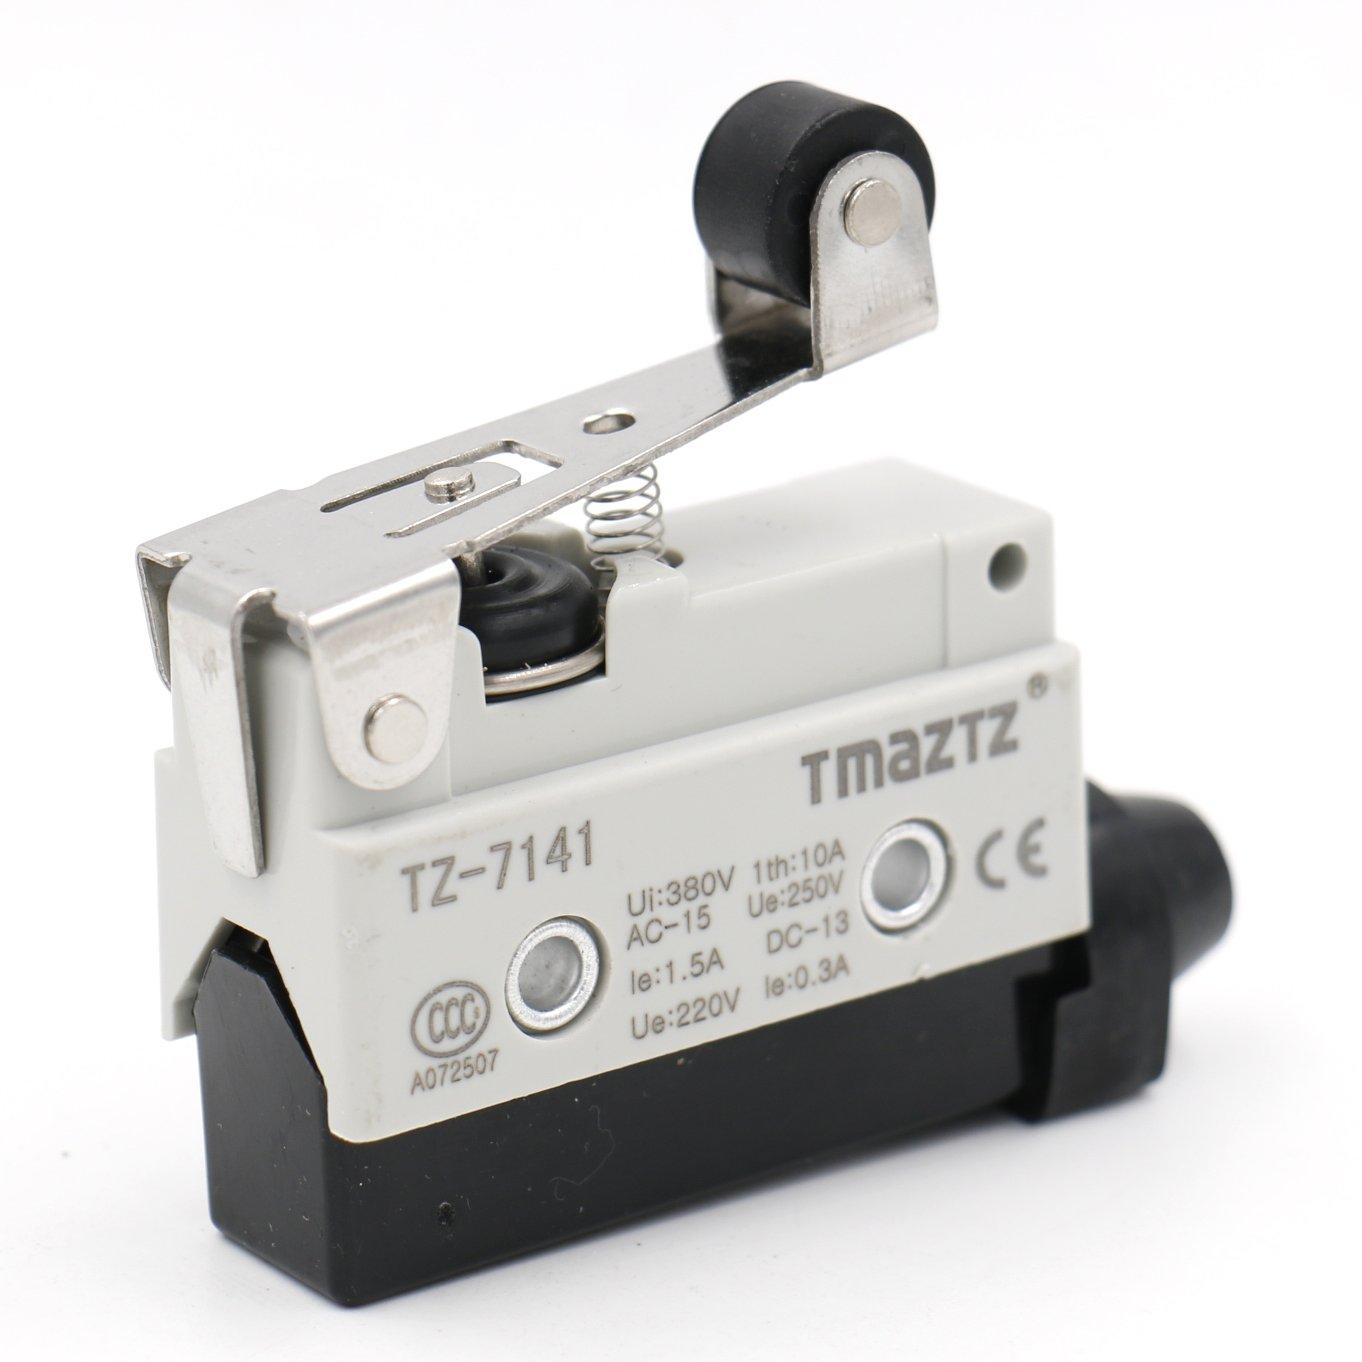 Heschen horizontal Limit Switch Tz-7141/Momentray court Roller Lever actionneur AC 380/V 10/A unipolaire